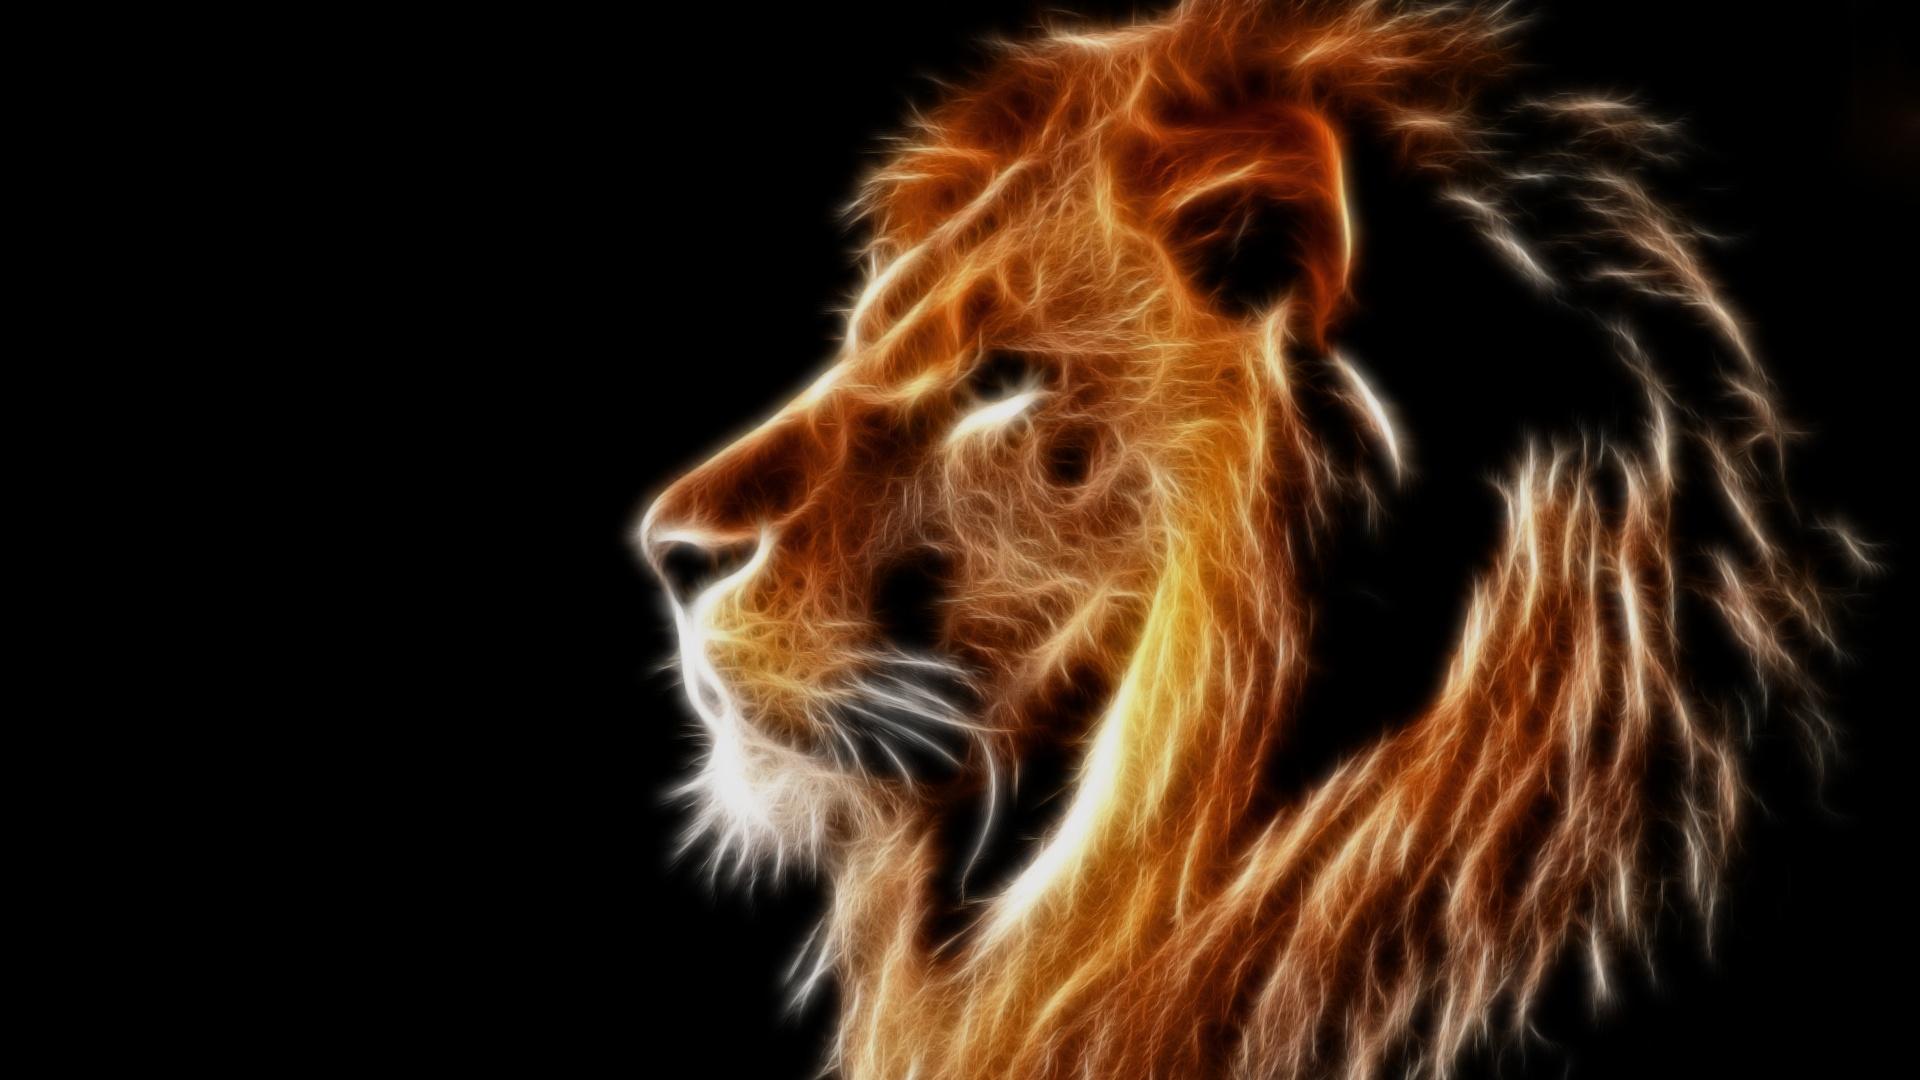 light lion wallpaper - photo #6